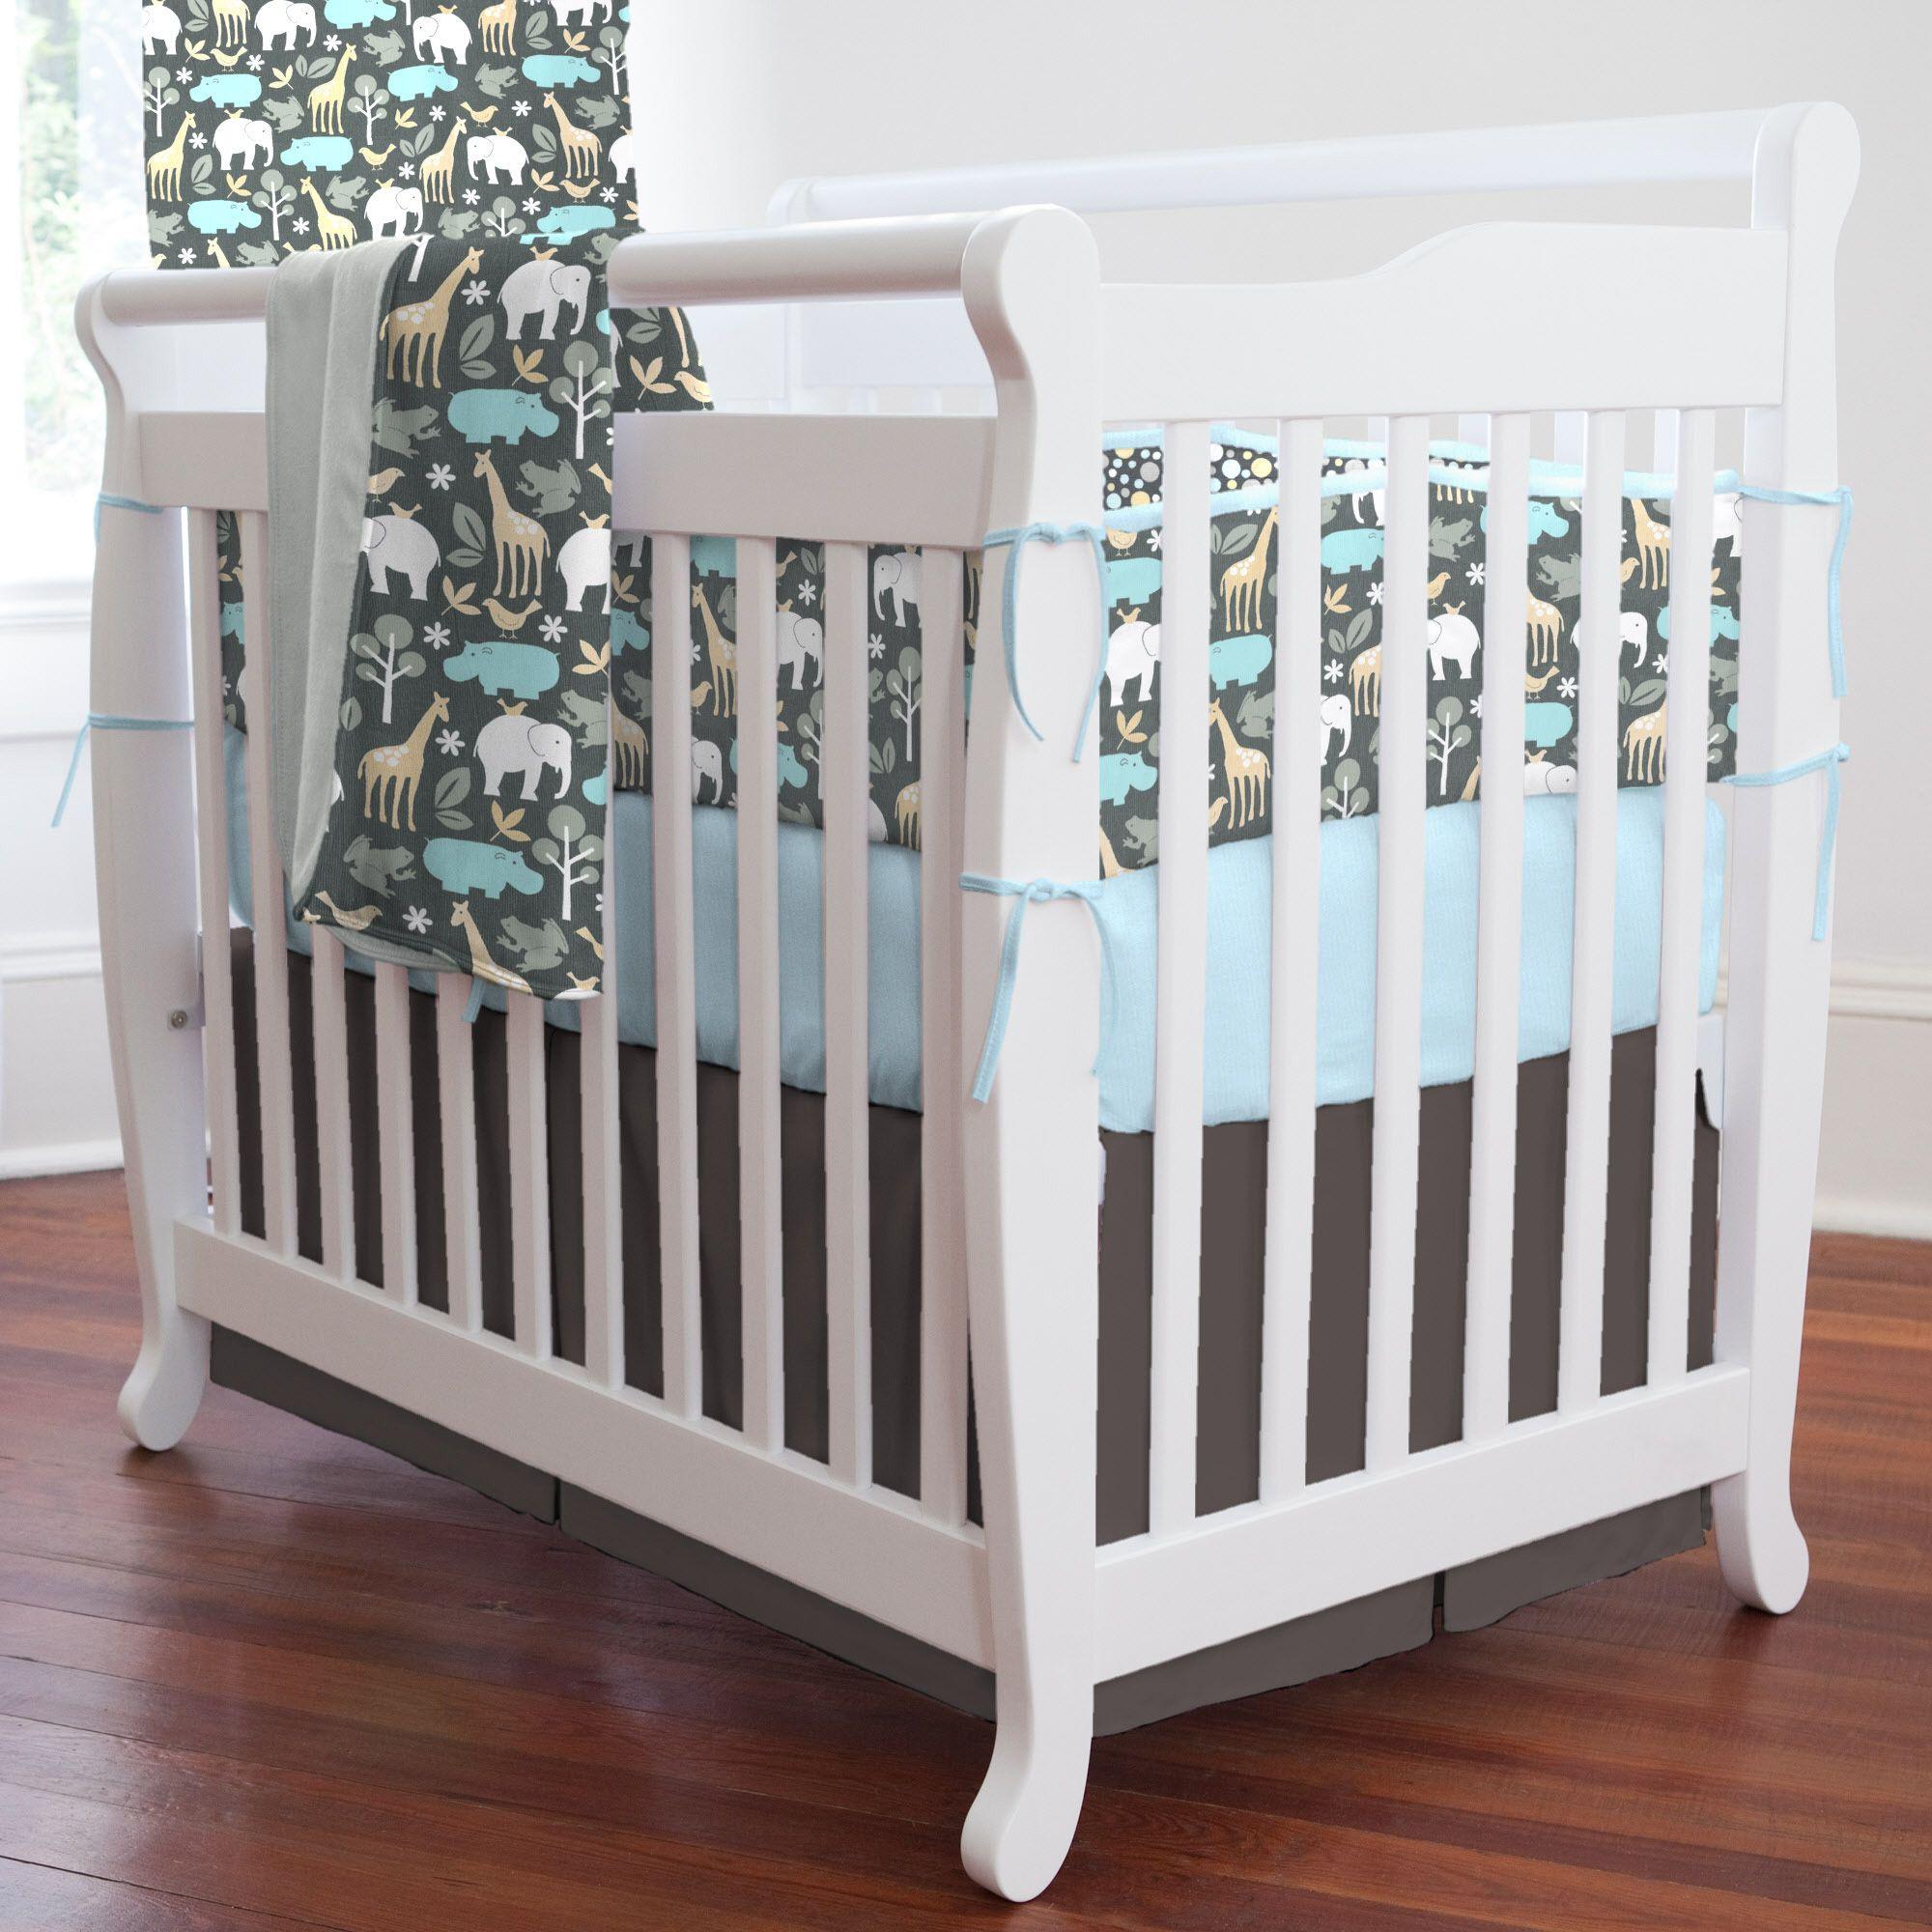 Gray Zoology Portable Crib Bedding   Carousel Designs